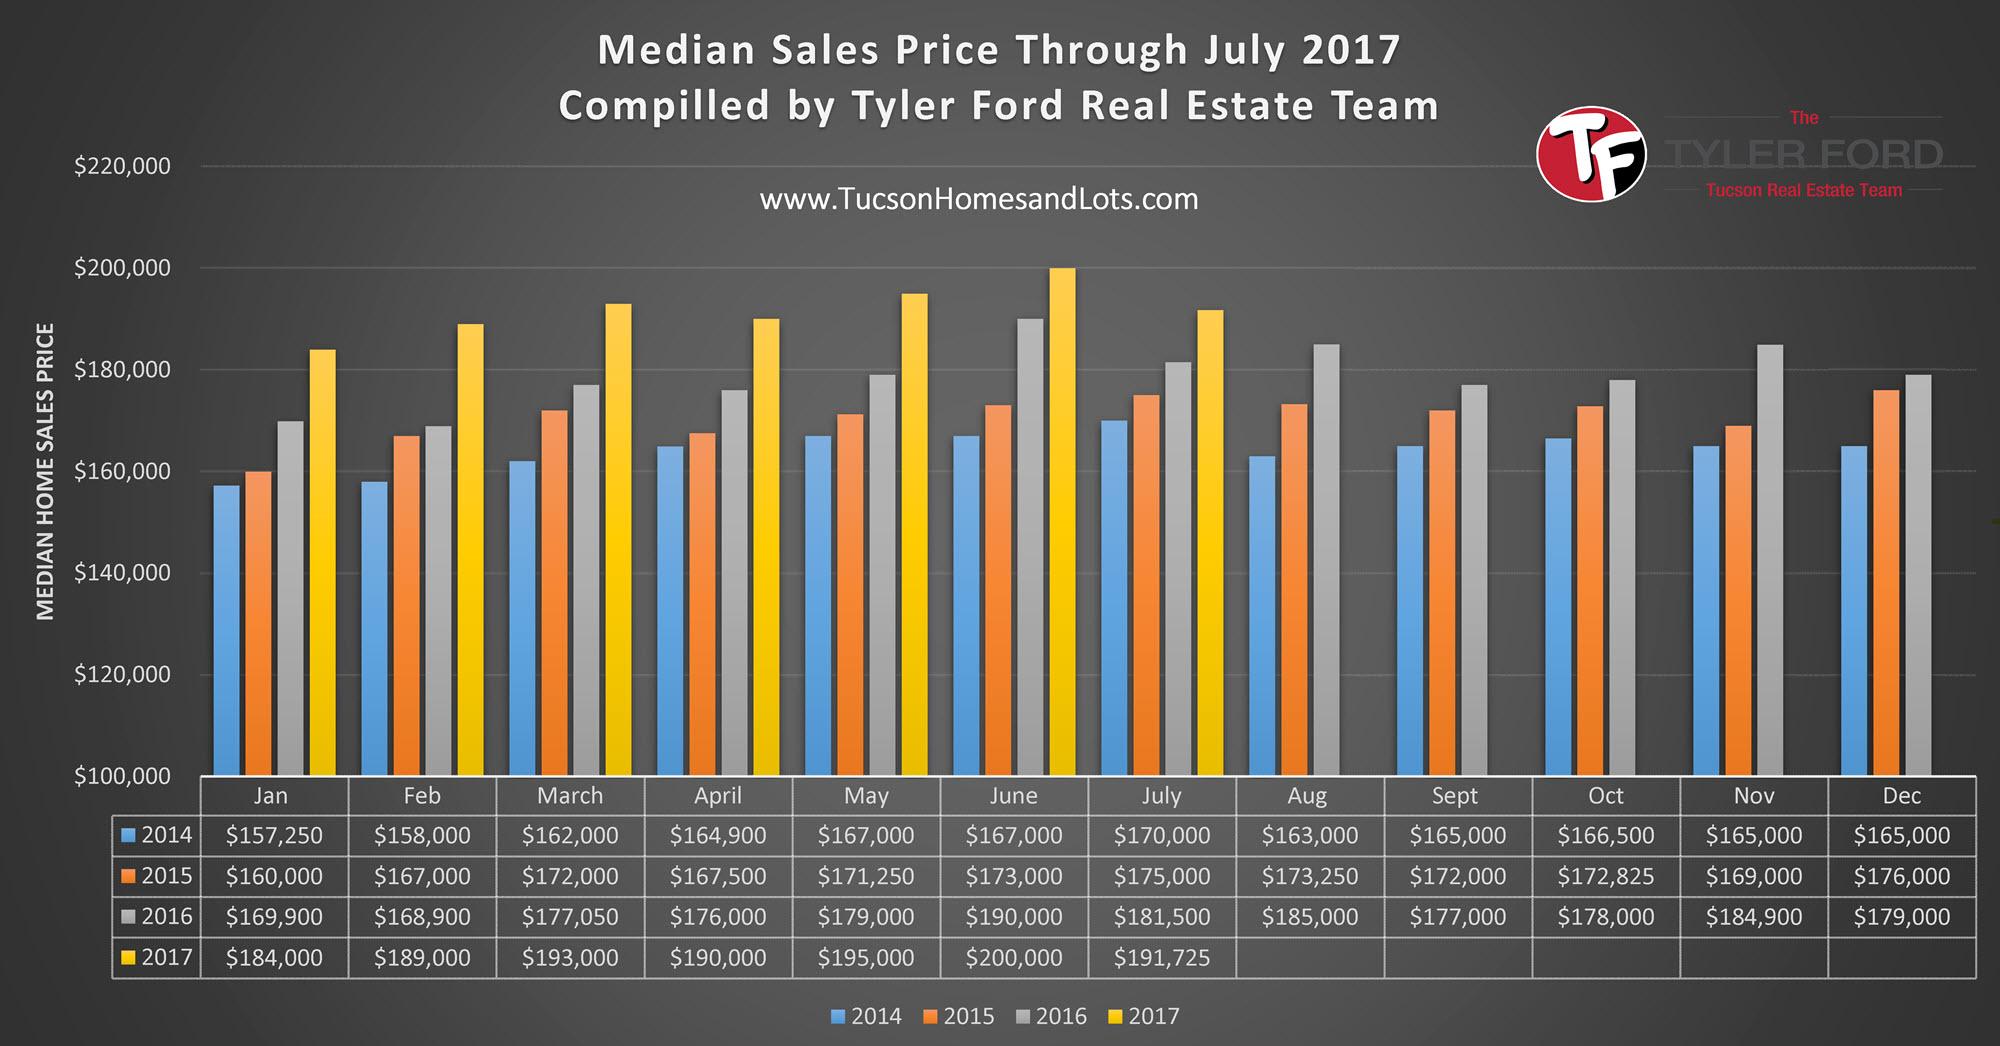 Median Home Sales Price in Tucson July 2017